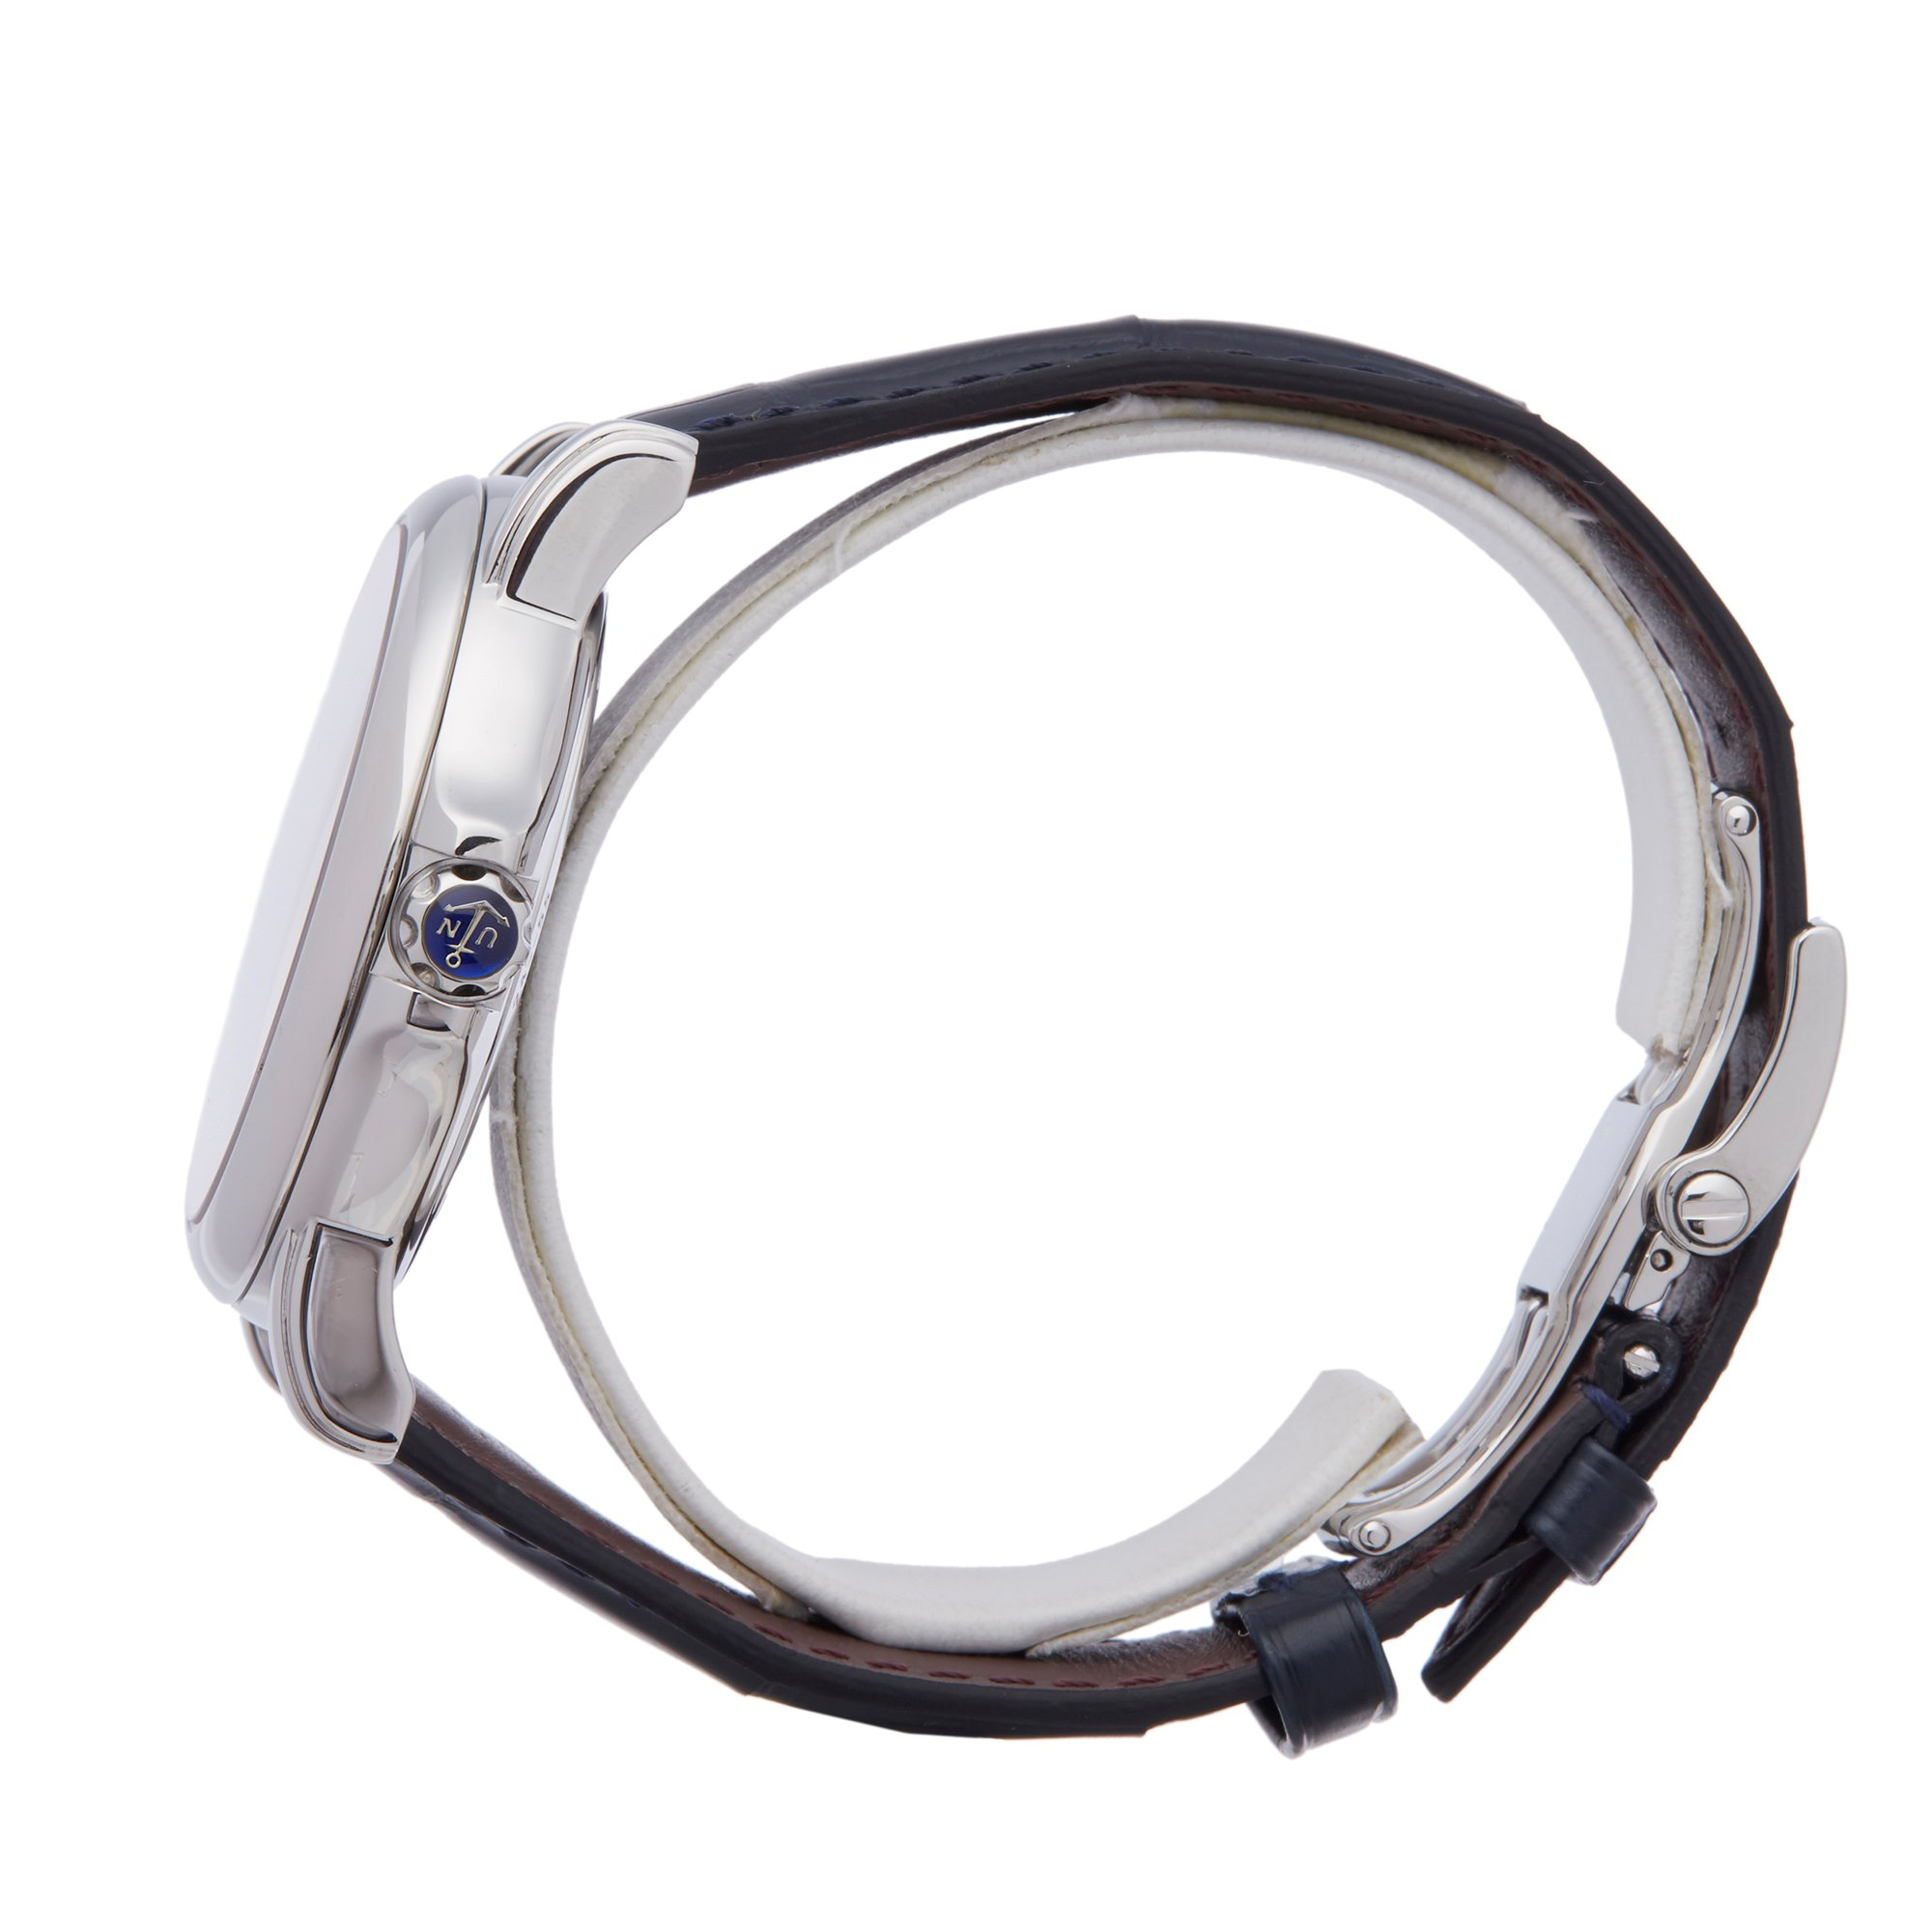 Ulysse Nardin Dual Time Stainless Steel 243-55